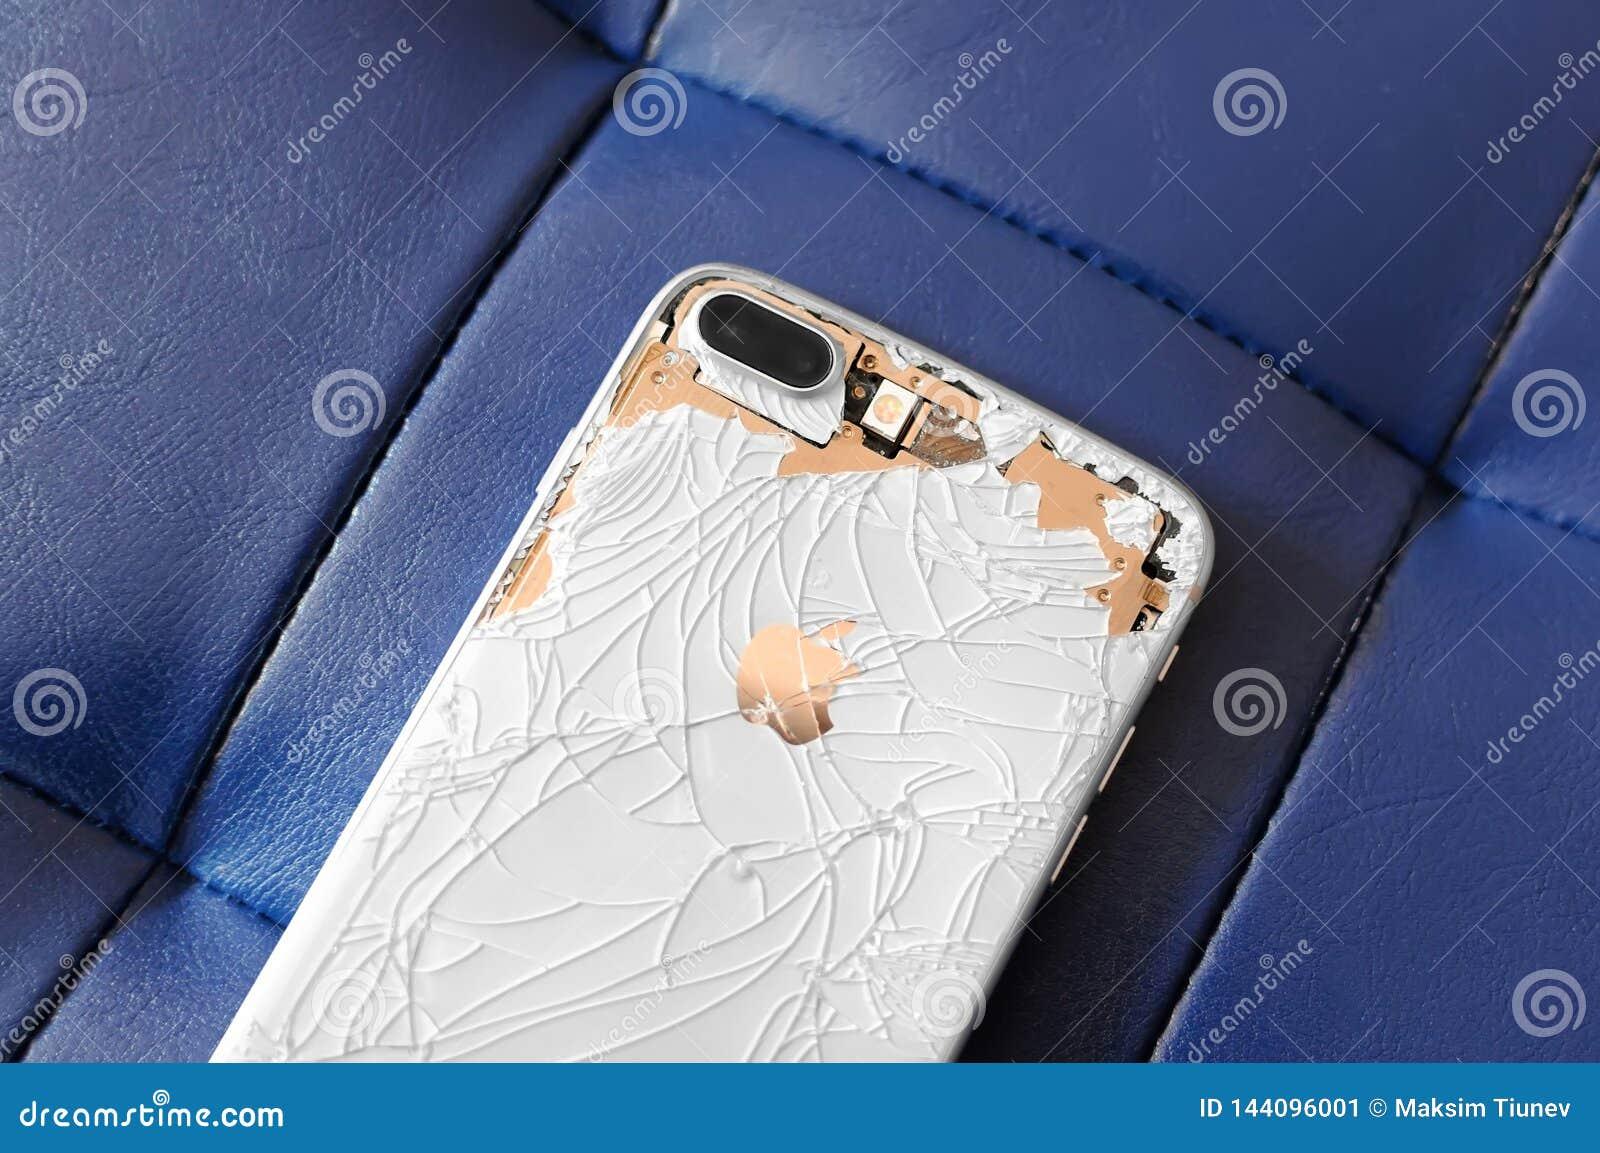 VISAGINAS, ΛΙΘΟΥΑΝΙΑ - 30 ΜΑΡΤΊΟΥ 2019: Η πίσω πλευρά ενός σπασμένου iPhone 8 συν είναι άσπρη και χρυσή σε ένα μπλε υπόβαθρο δέρμ